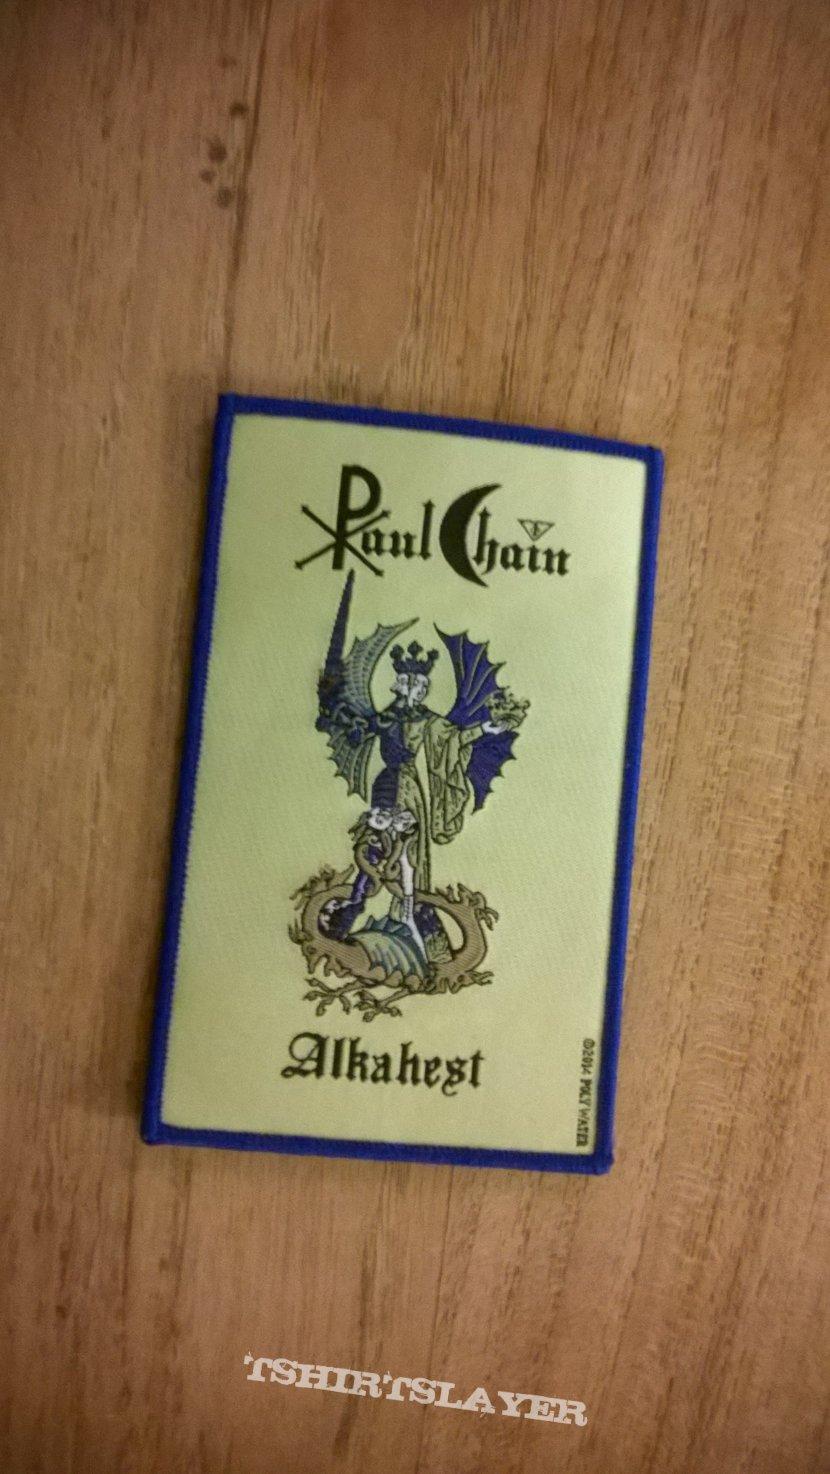 Paul Chain Alkahest Patch